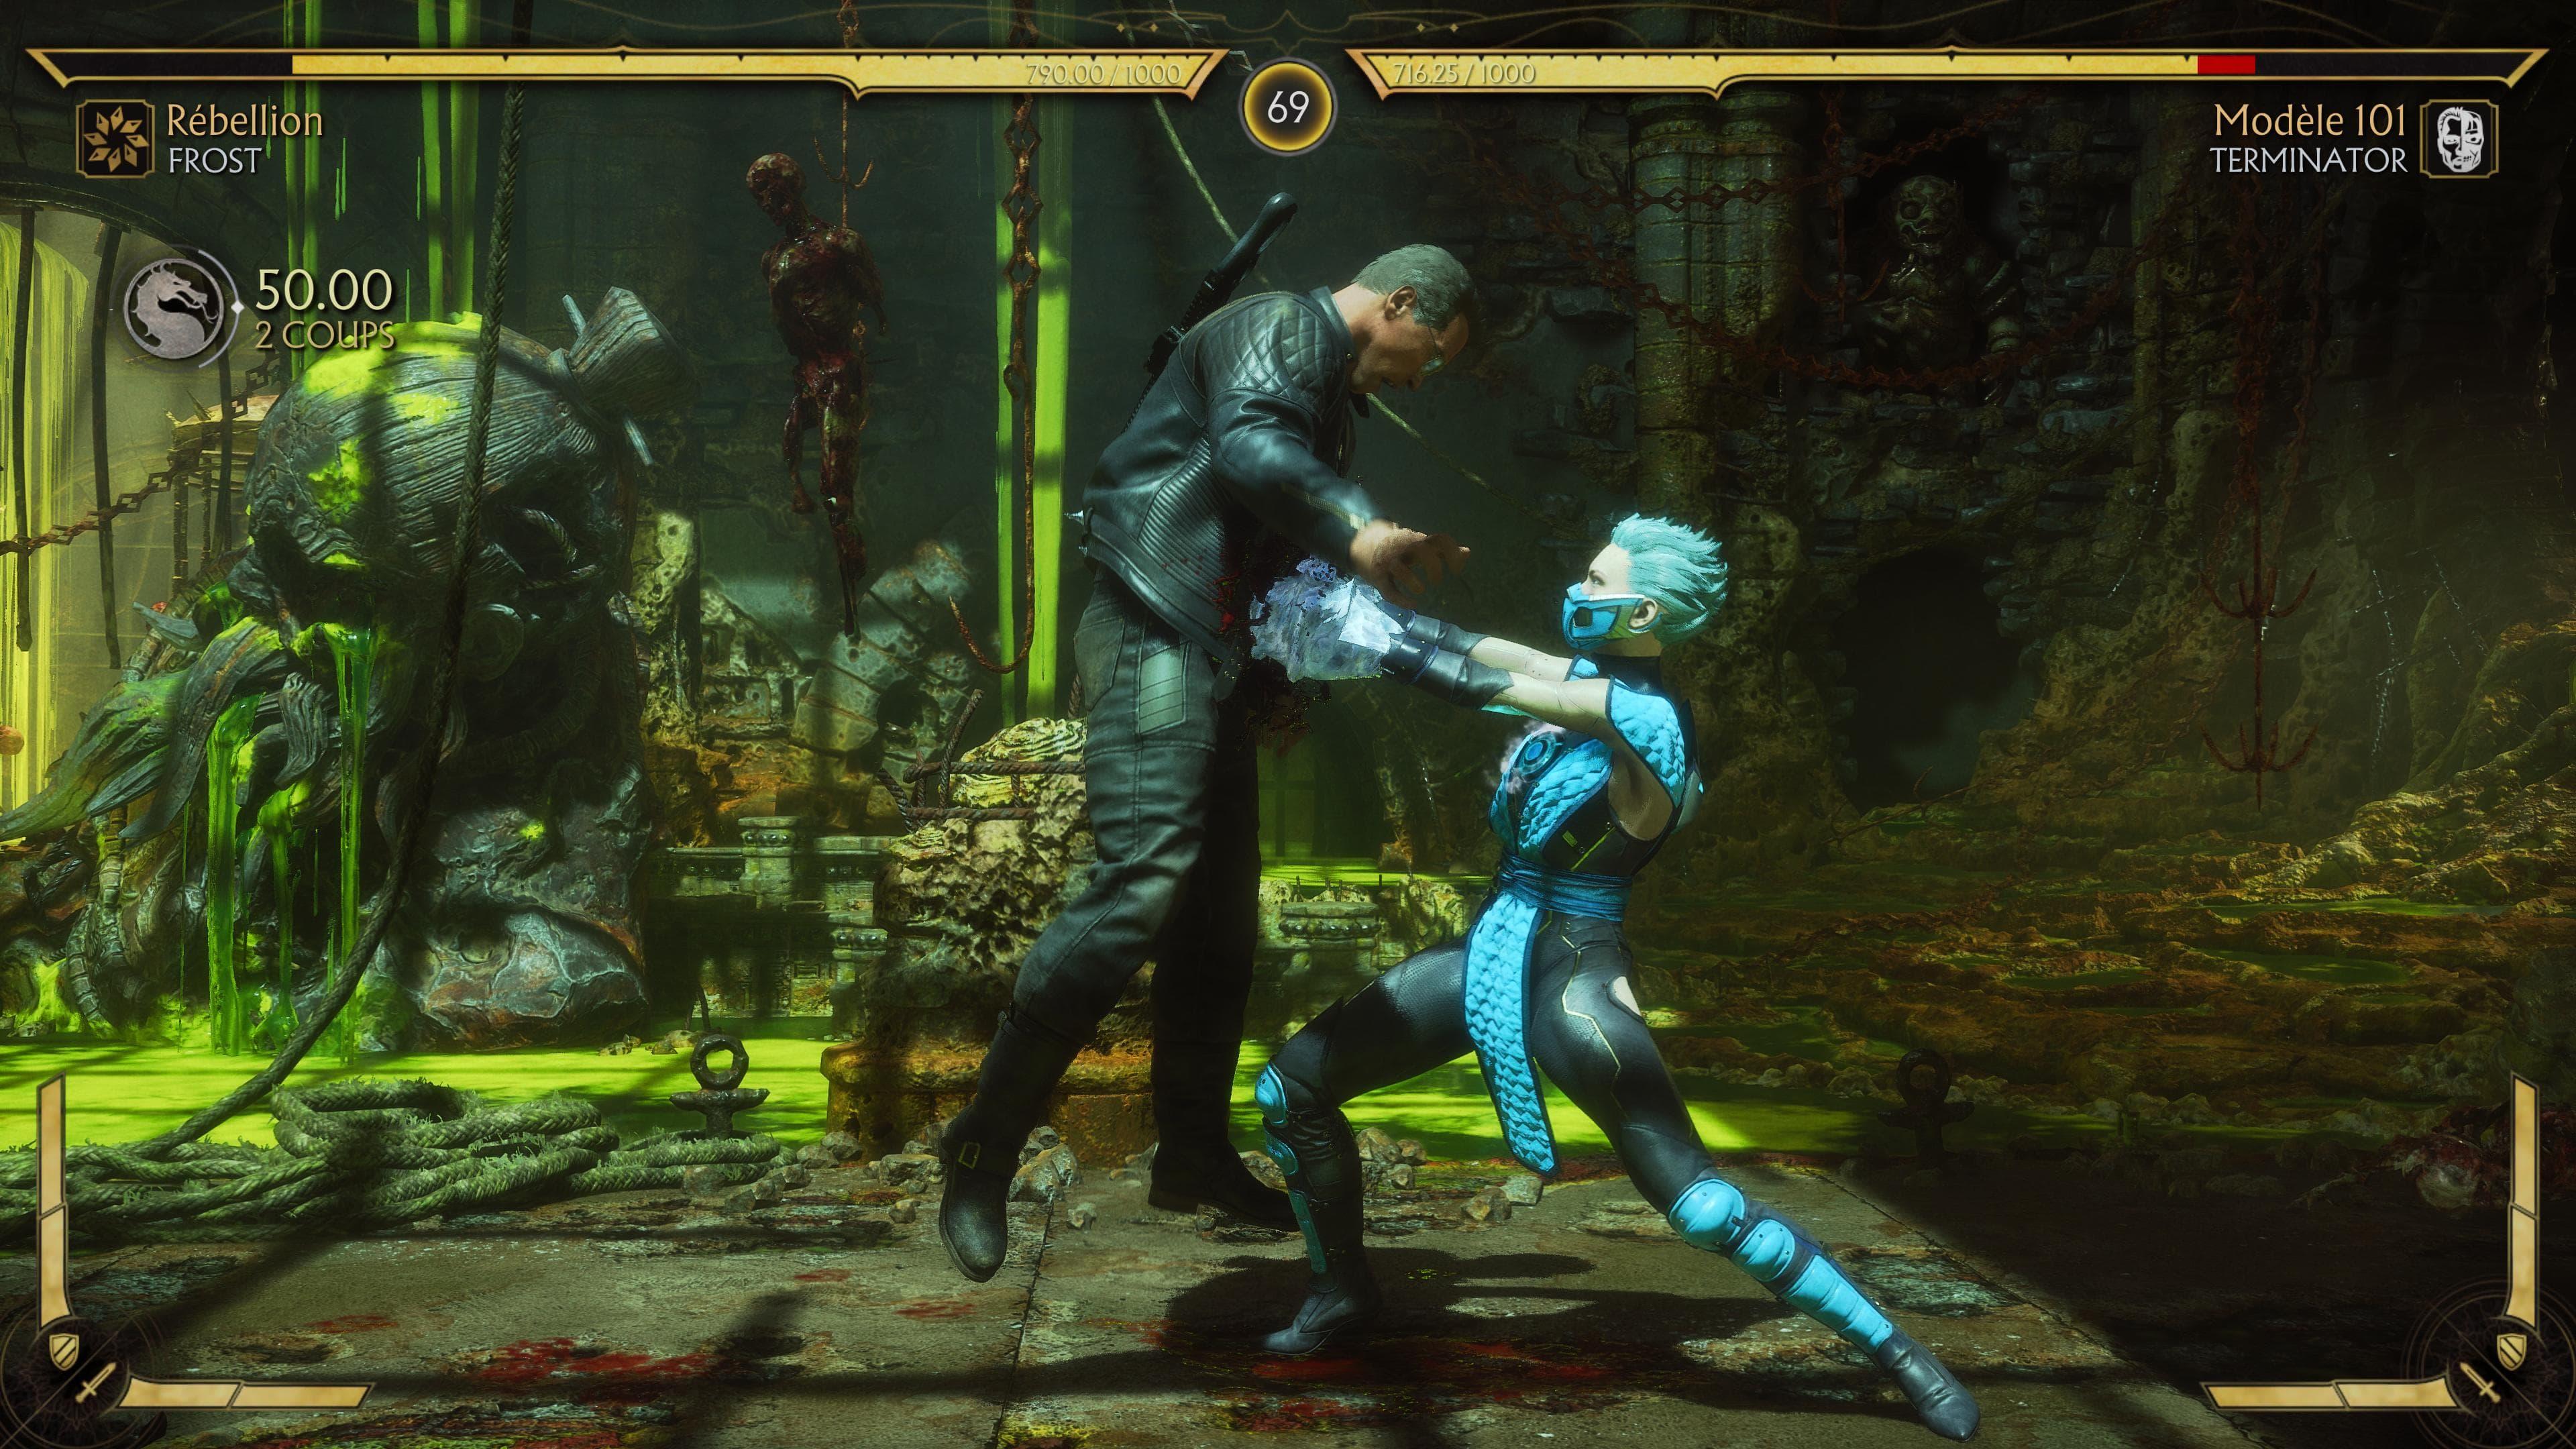 Xbox Series X & S Mortal Kombat 11 Ultimate